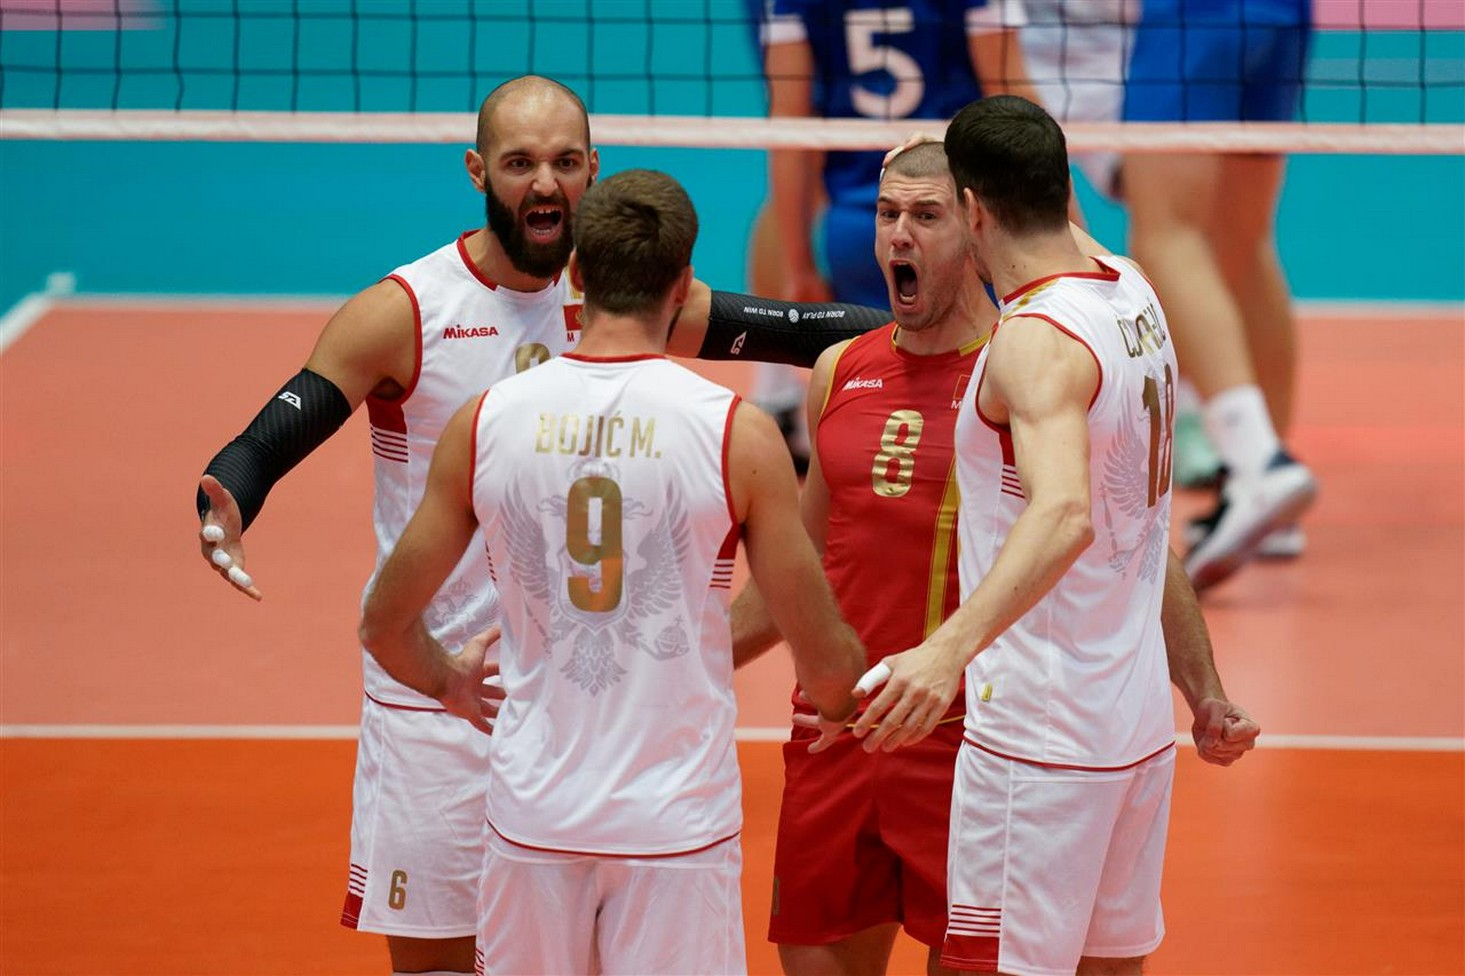 crna gora estonija seniori reprezentacija odbojkasi evropsko prvenstvo 024